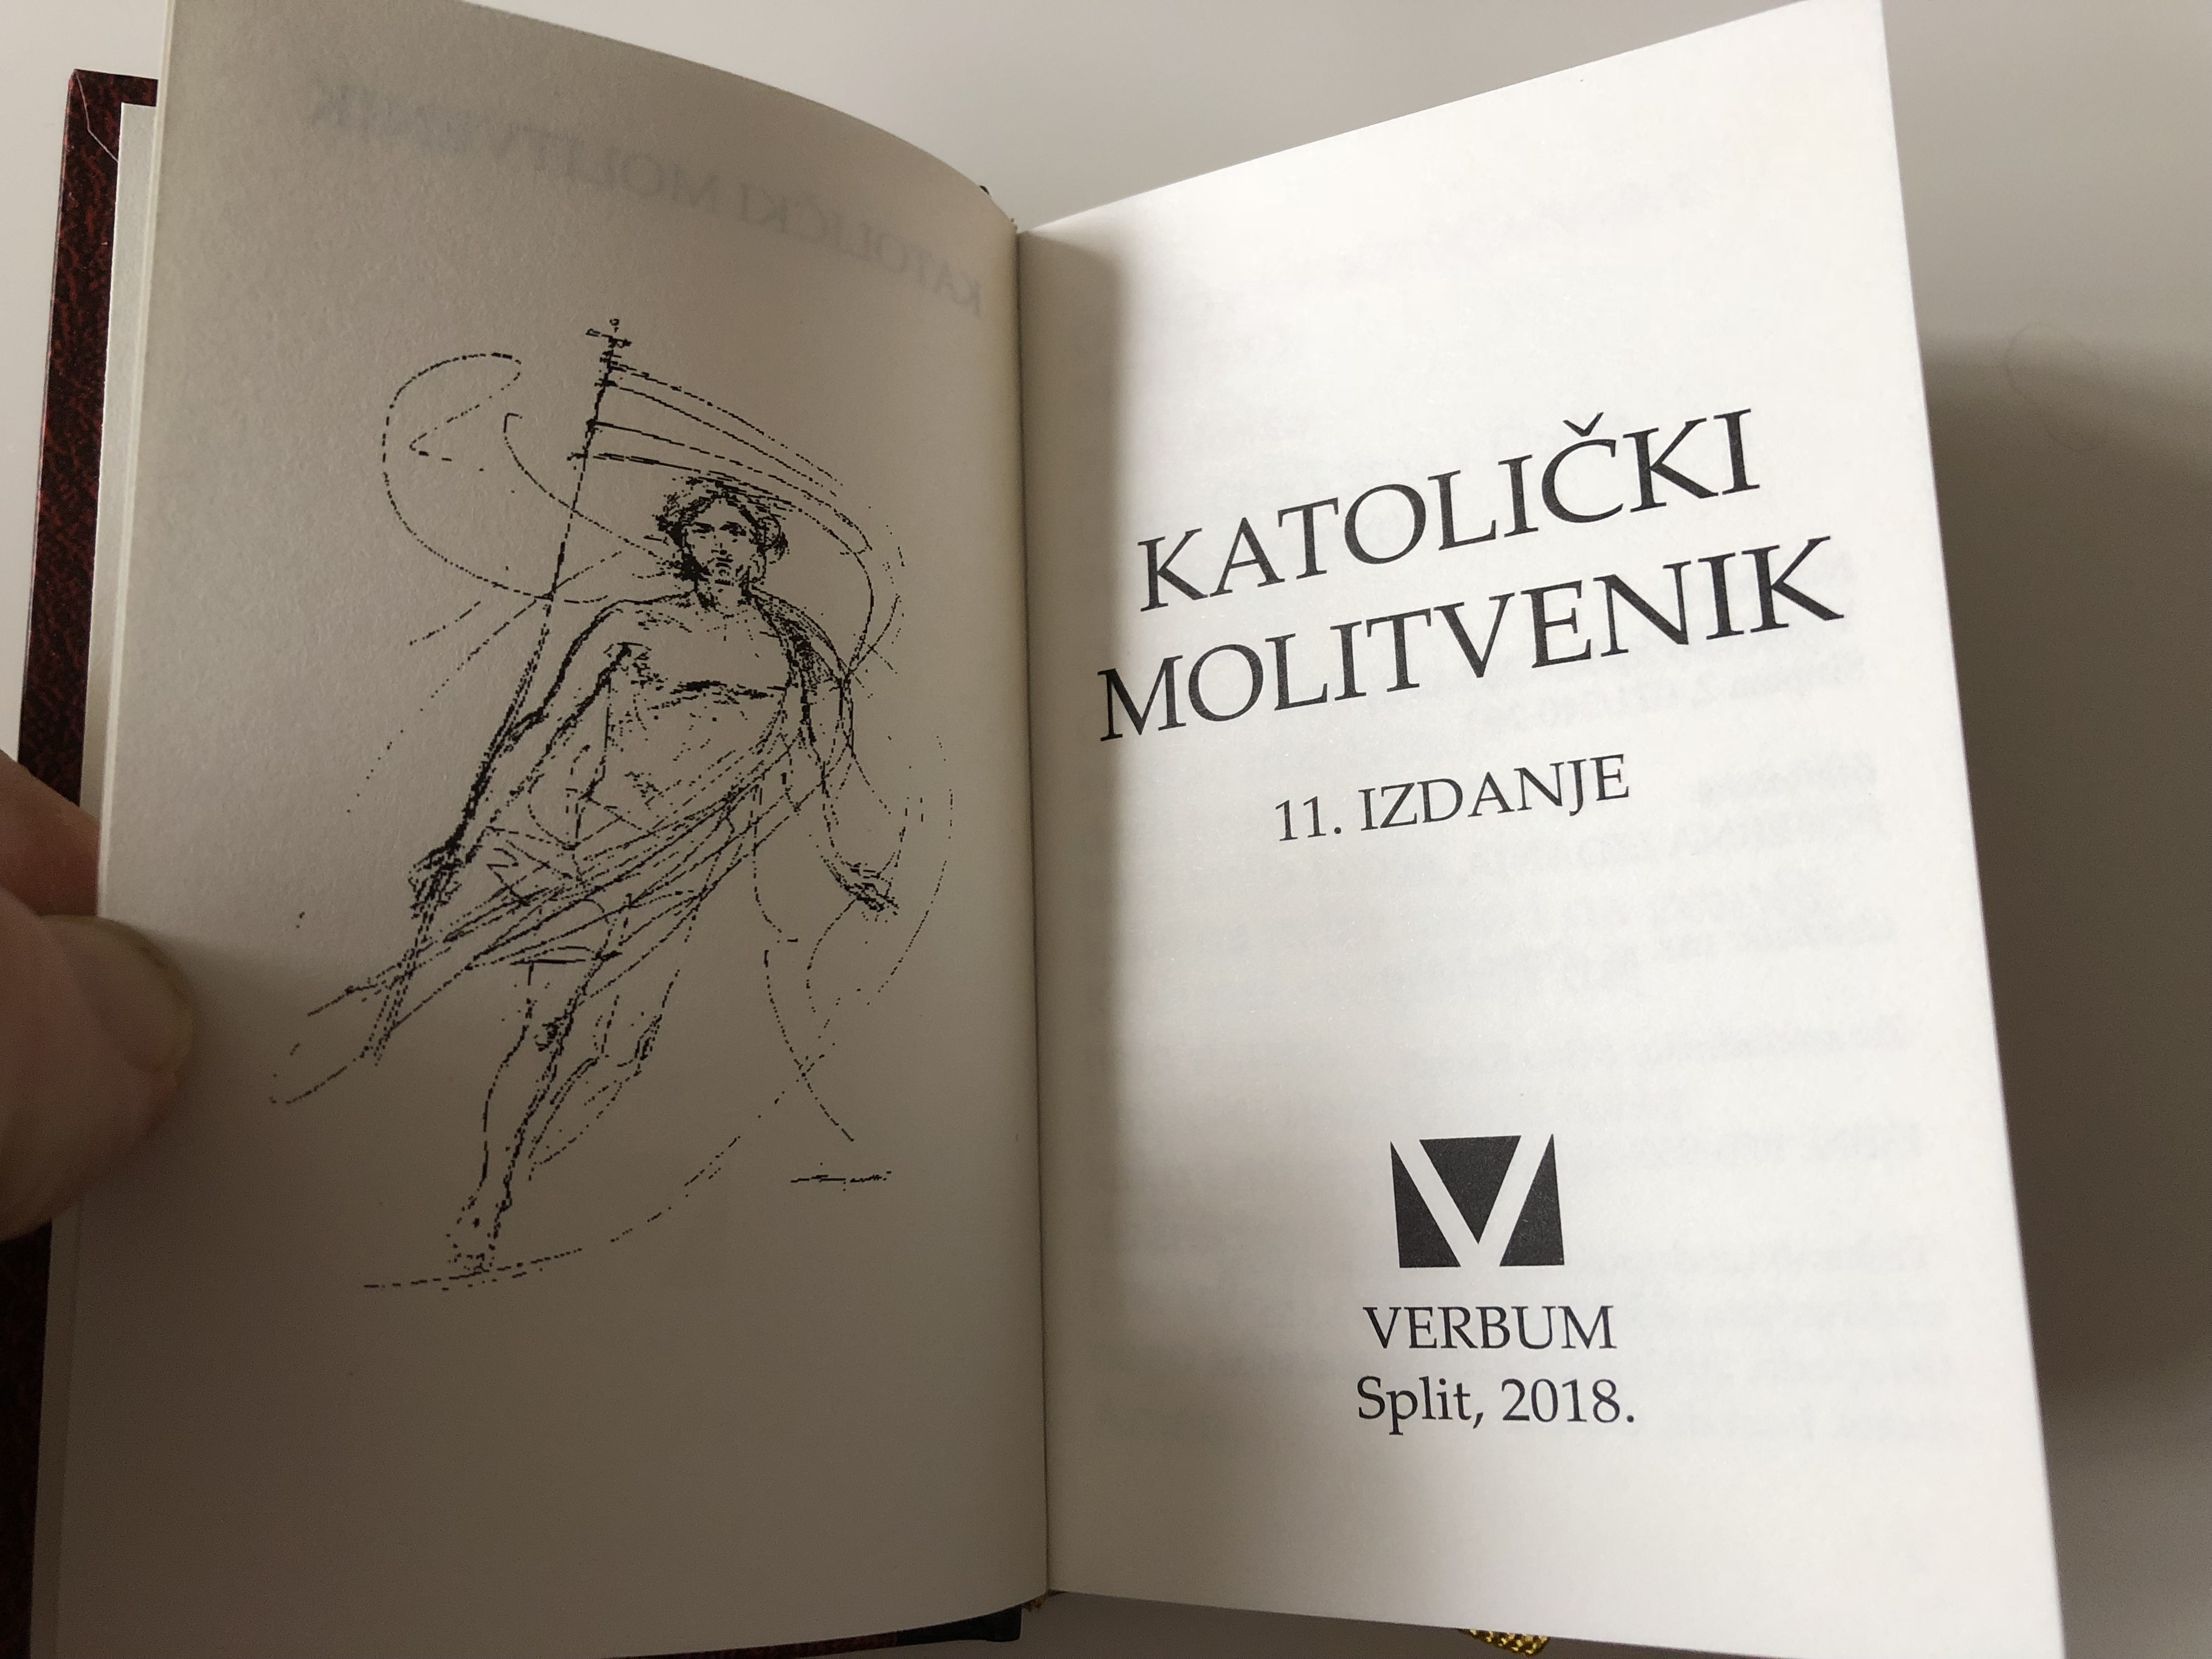 croatian-small-catholic-prayer-book-11th-edition-3-.jpg